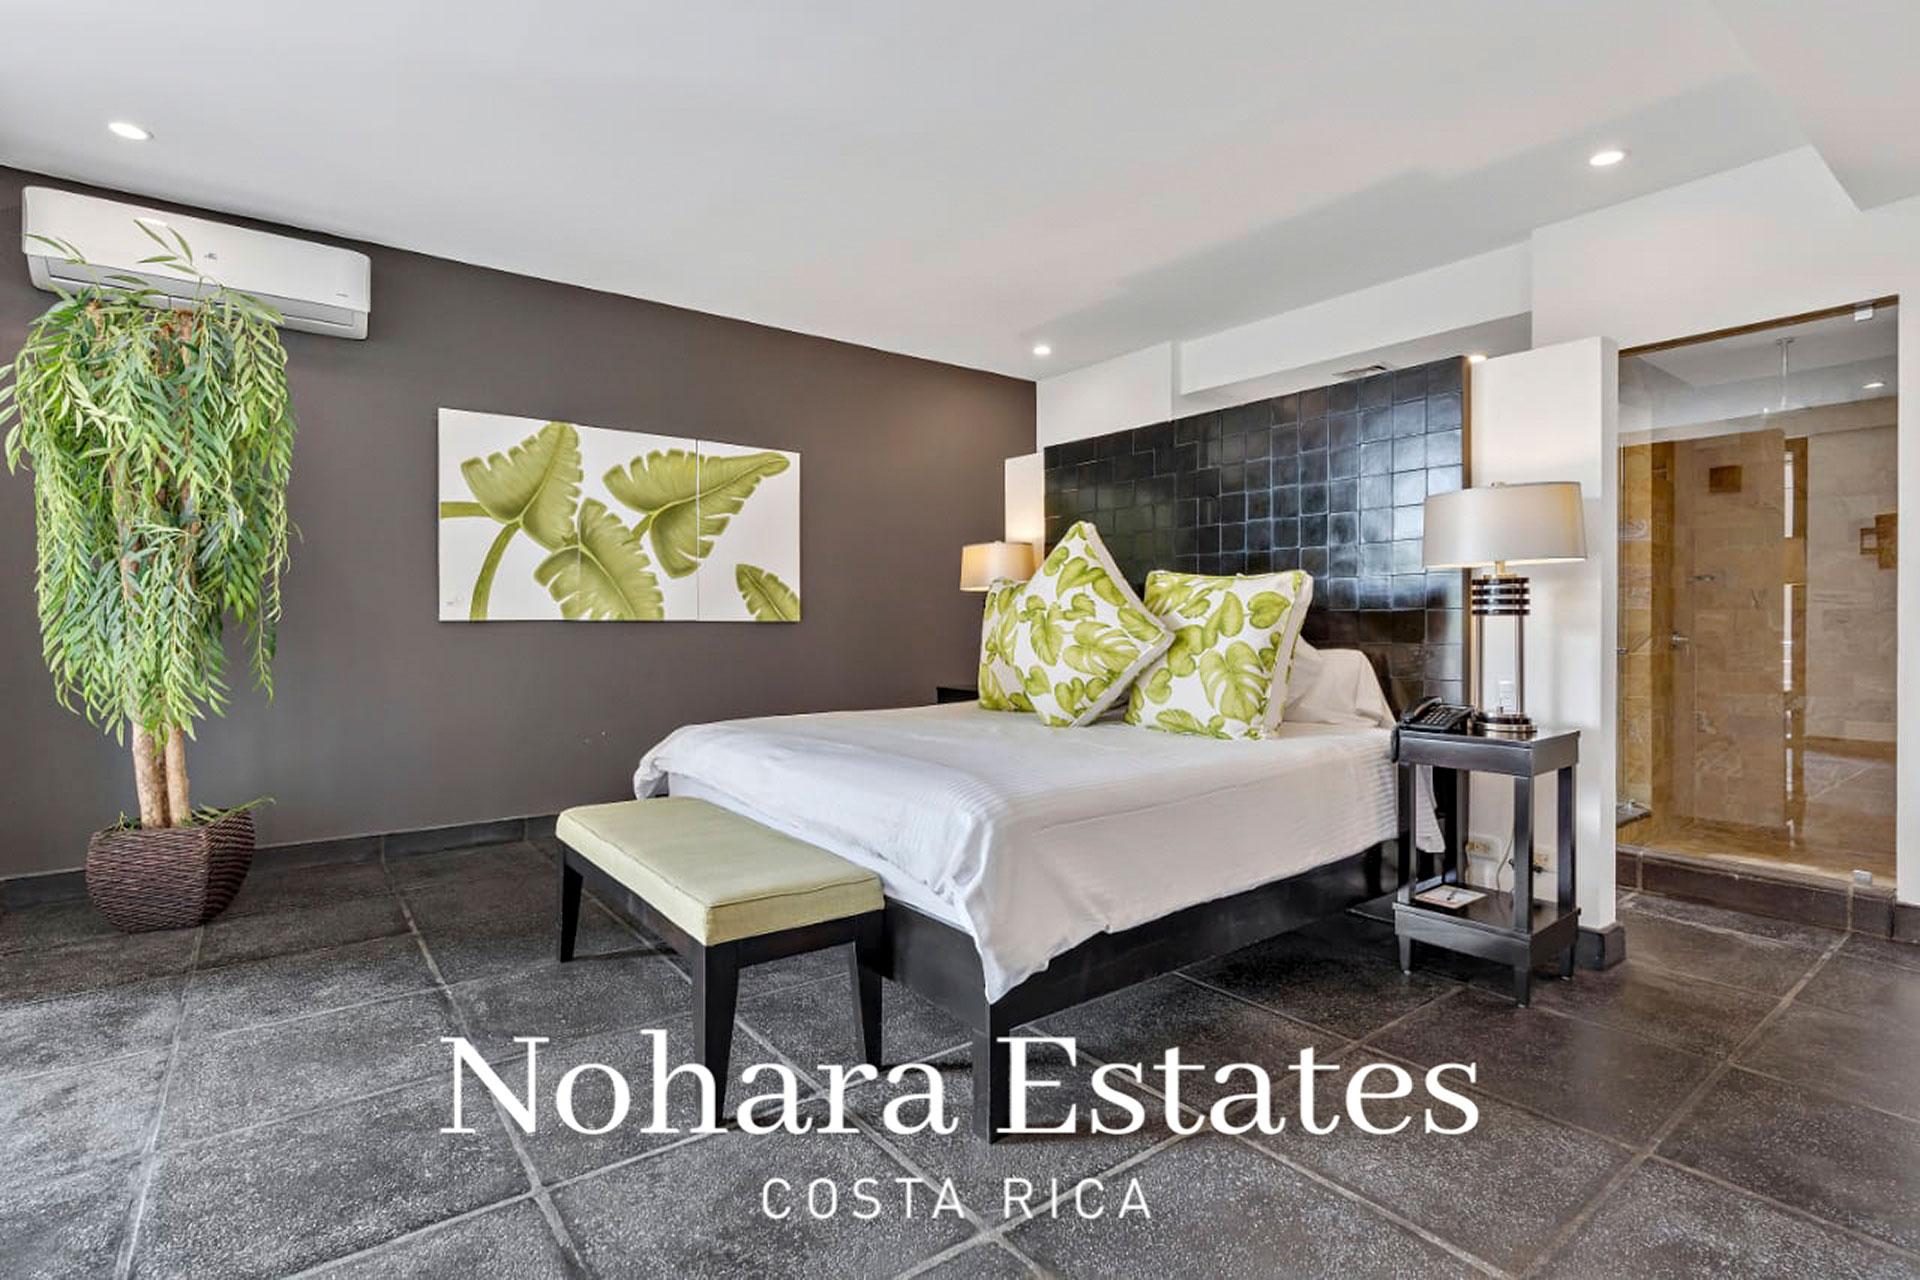 Nohara Estates Costa Rica 125 Apartment Quepos Los Altos 18